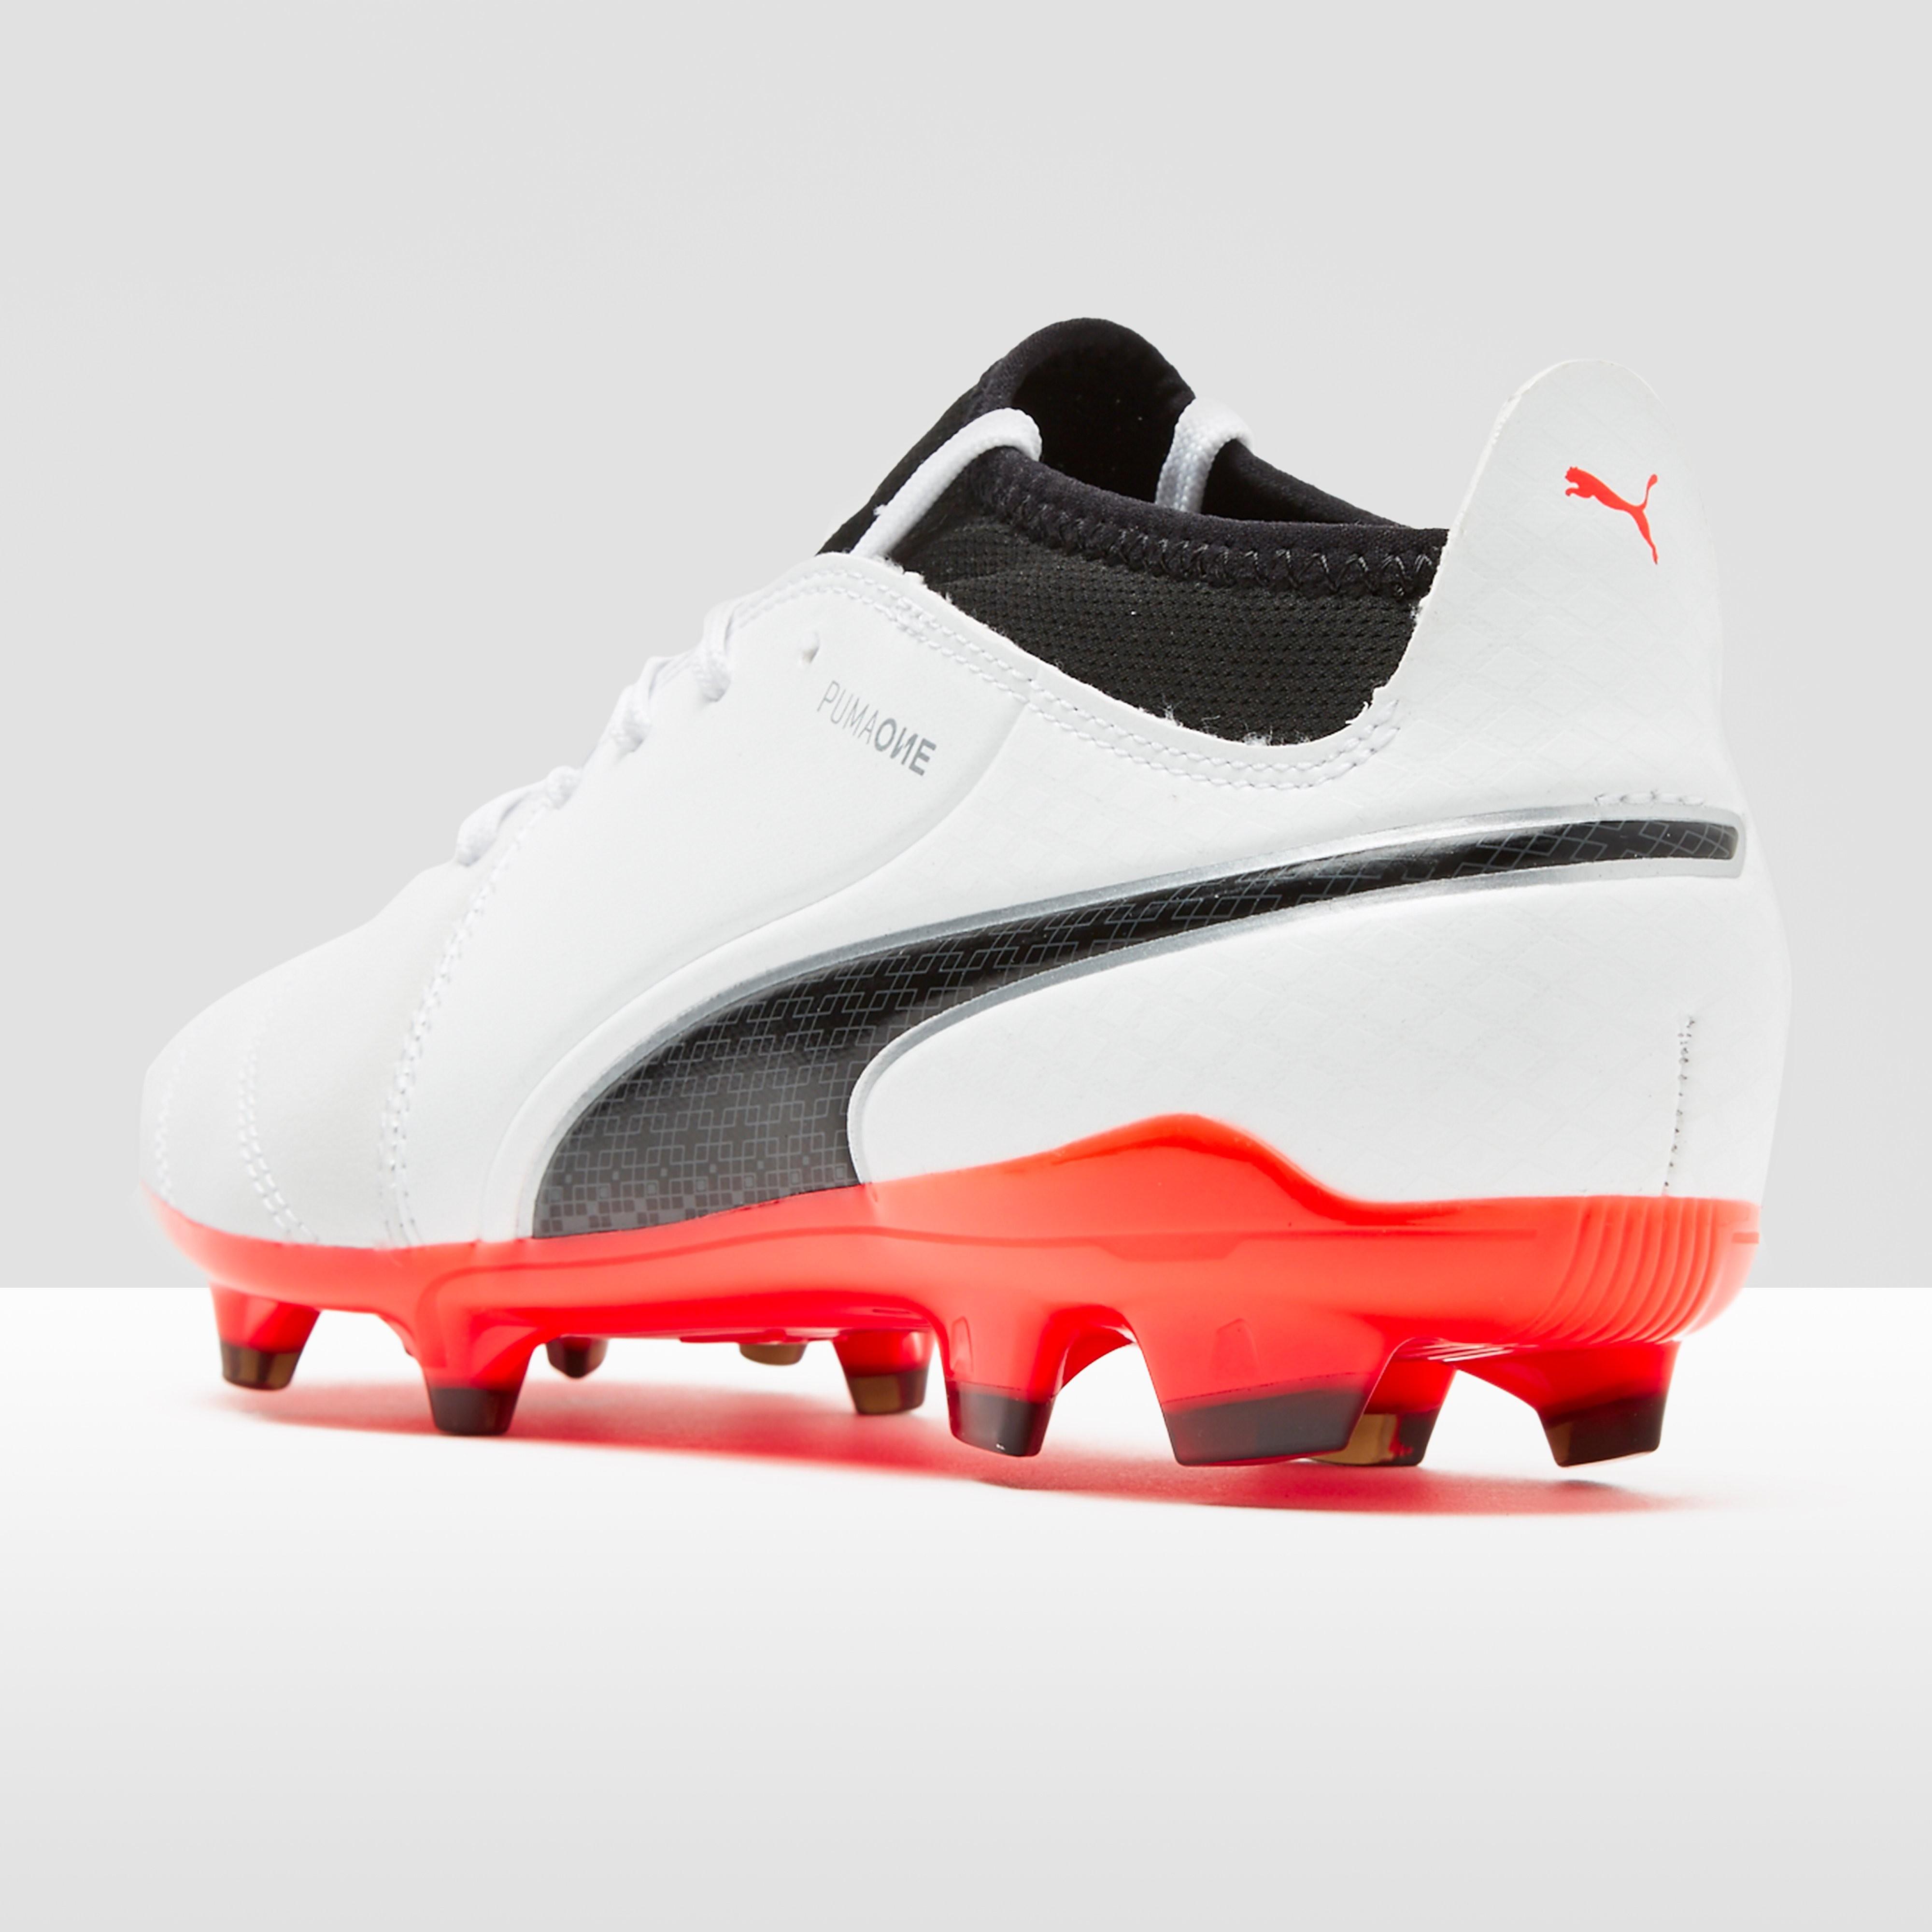 PUMA One 17.3 FG Men's Football Boots